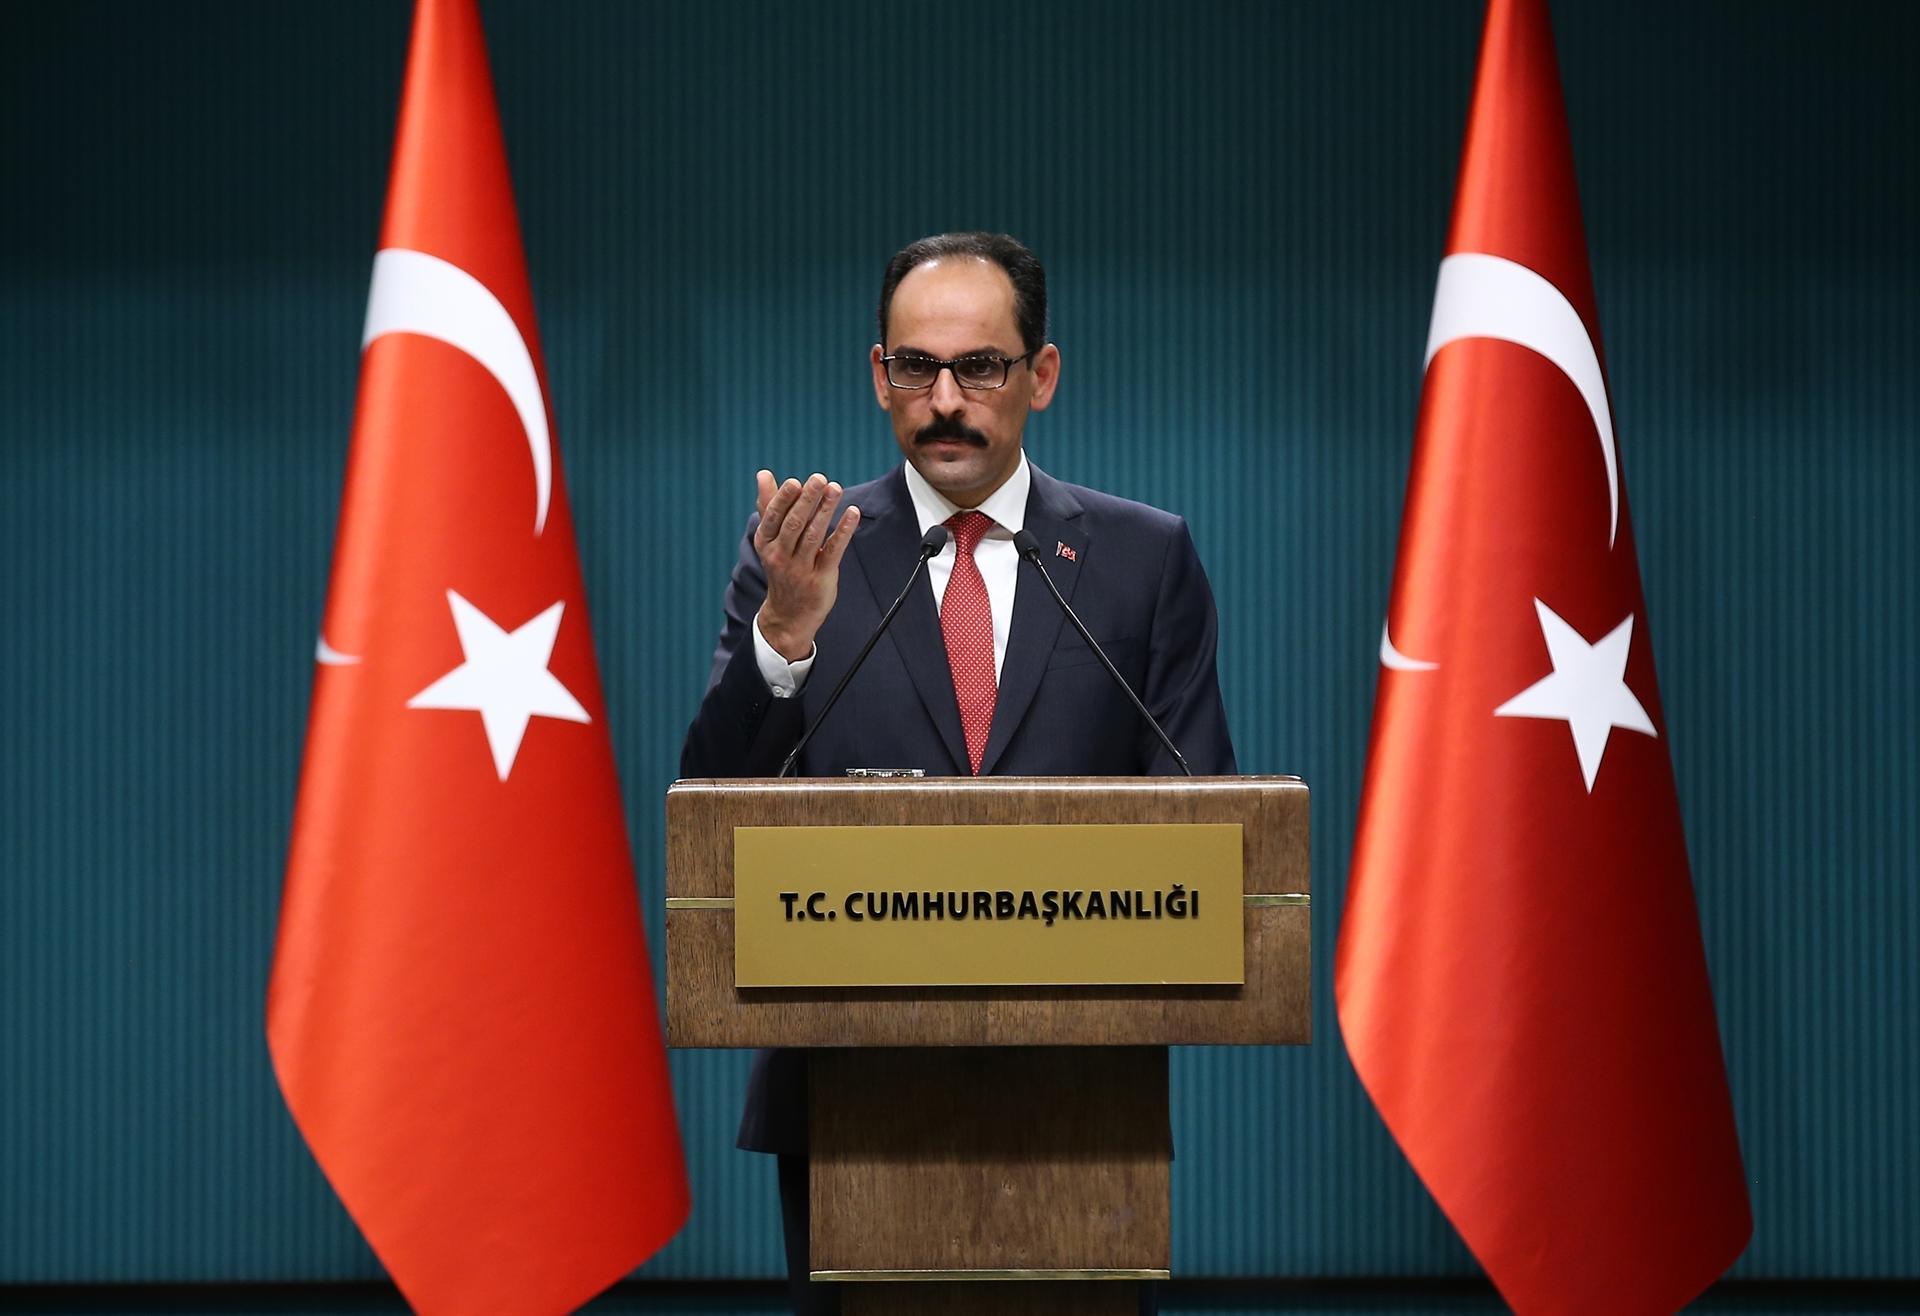 İbrahim Kalın: 'Ankara has been deeply disappointed byWashington's actions'